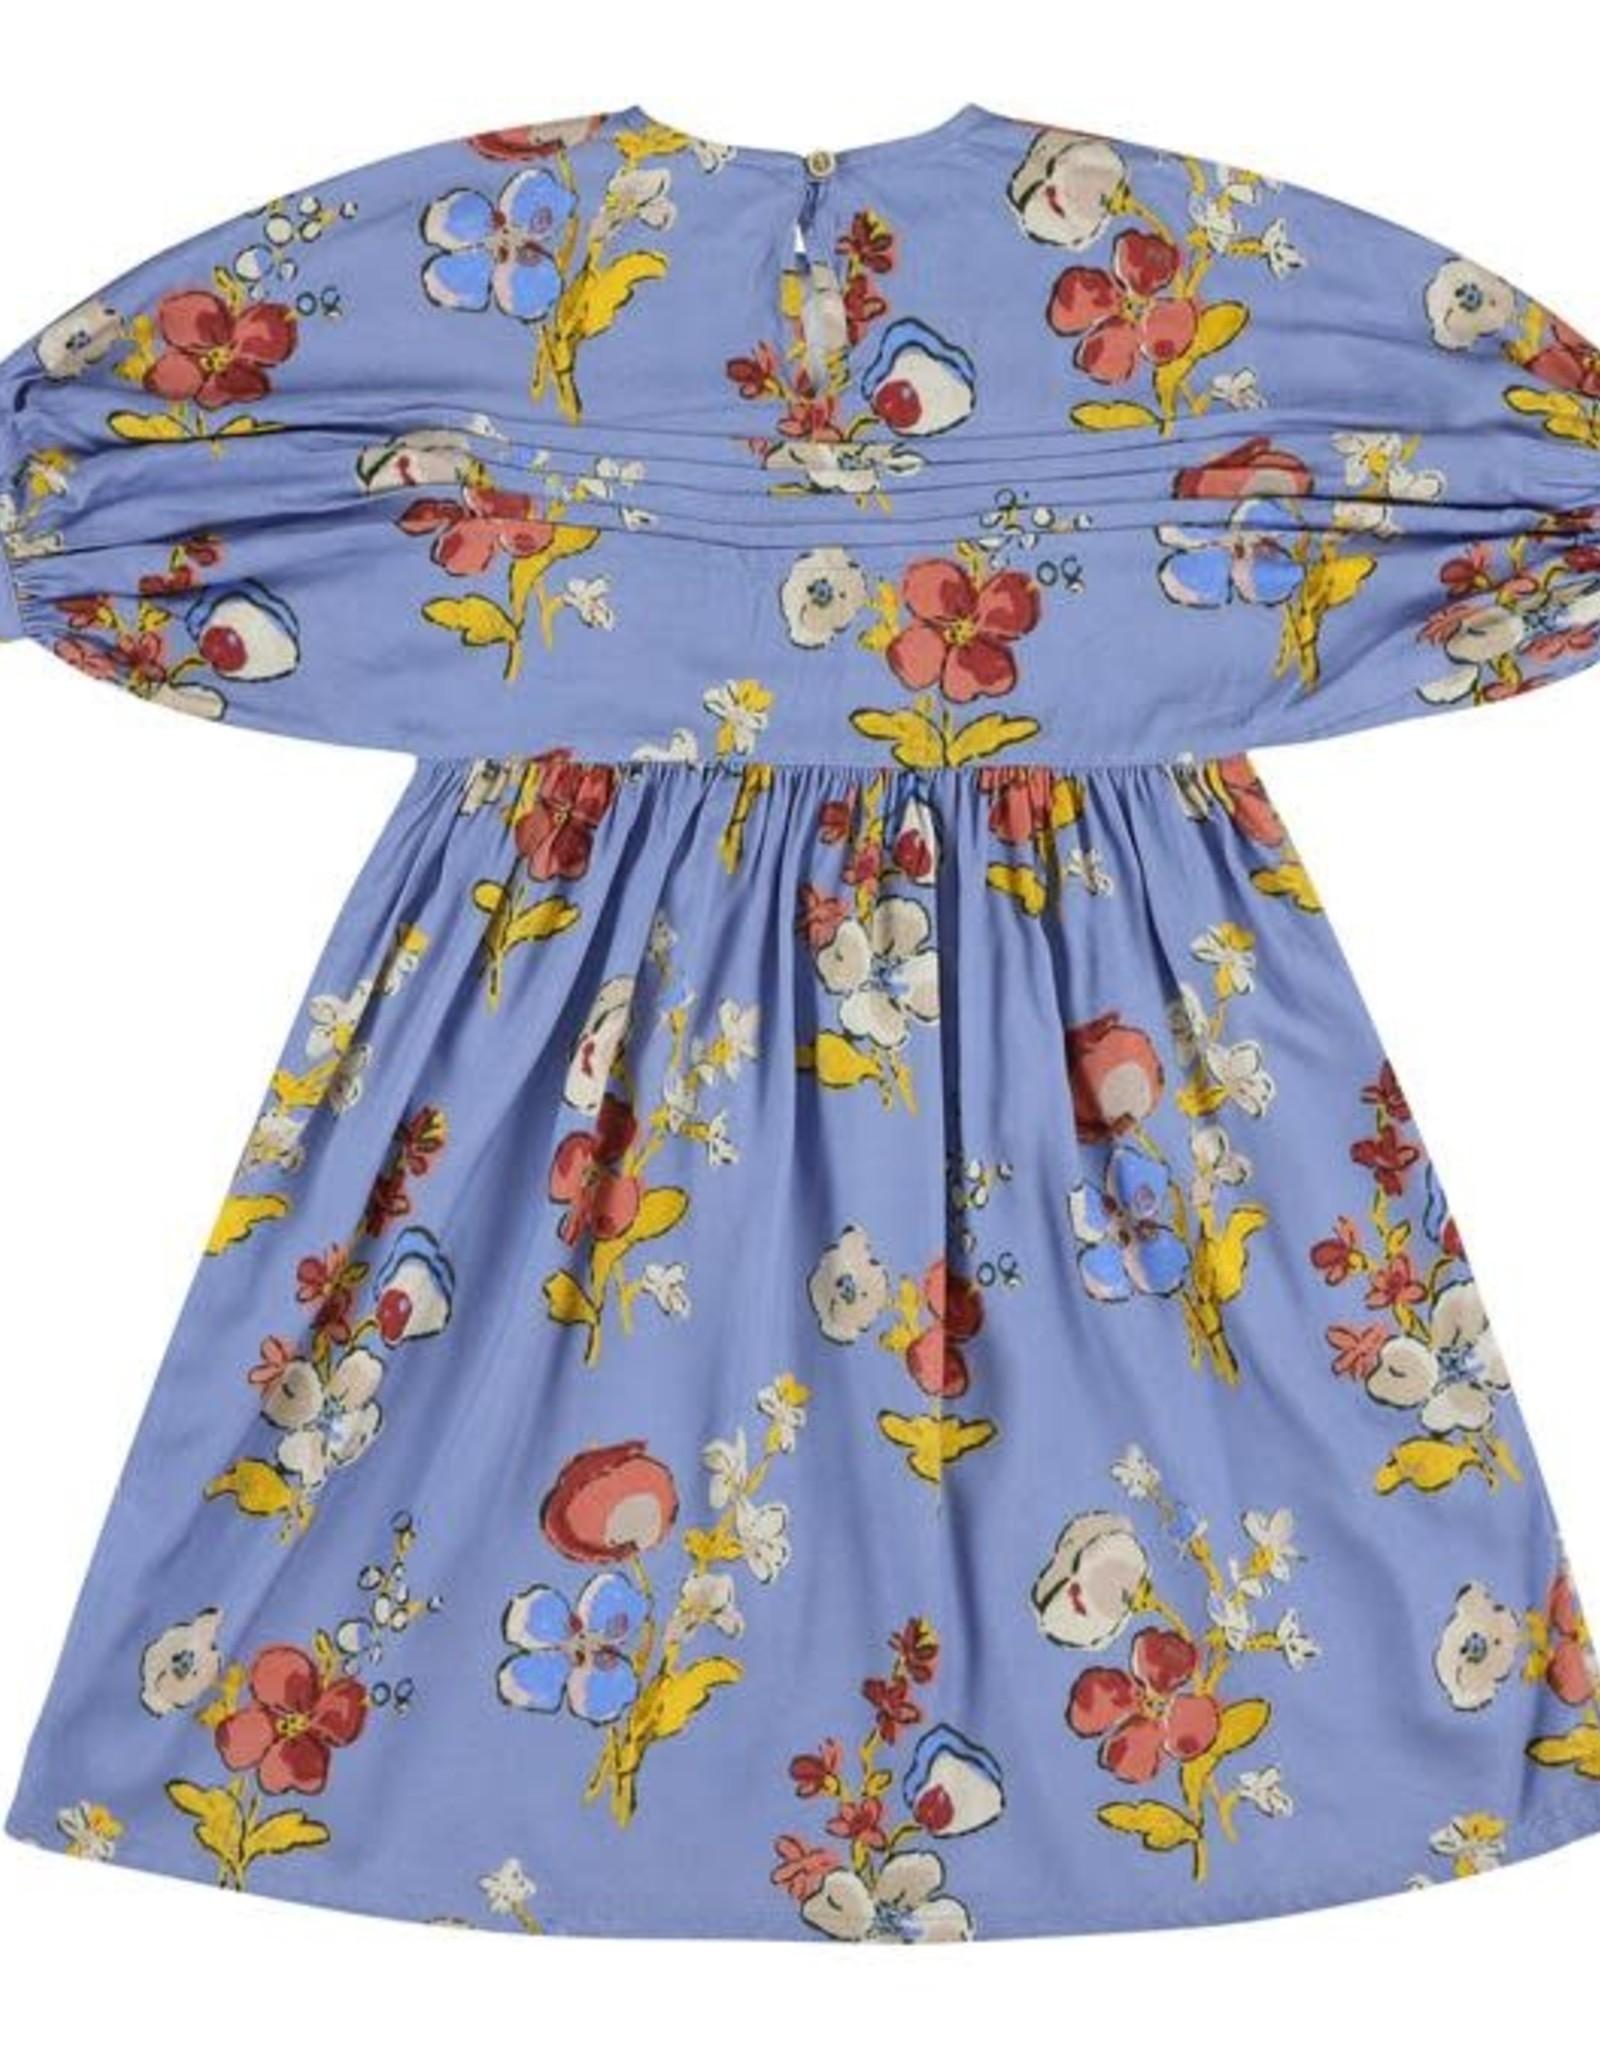 MORLEY MORLEY Nael appleblossom lavender